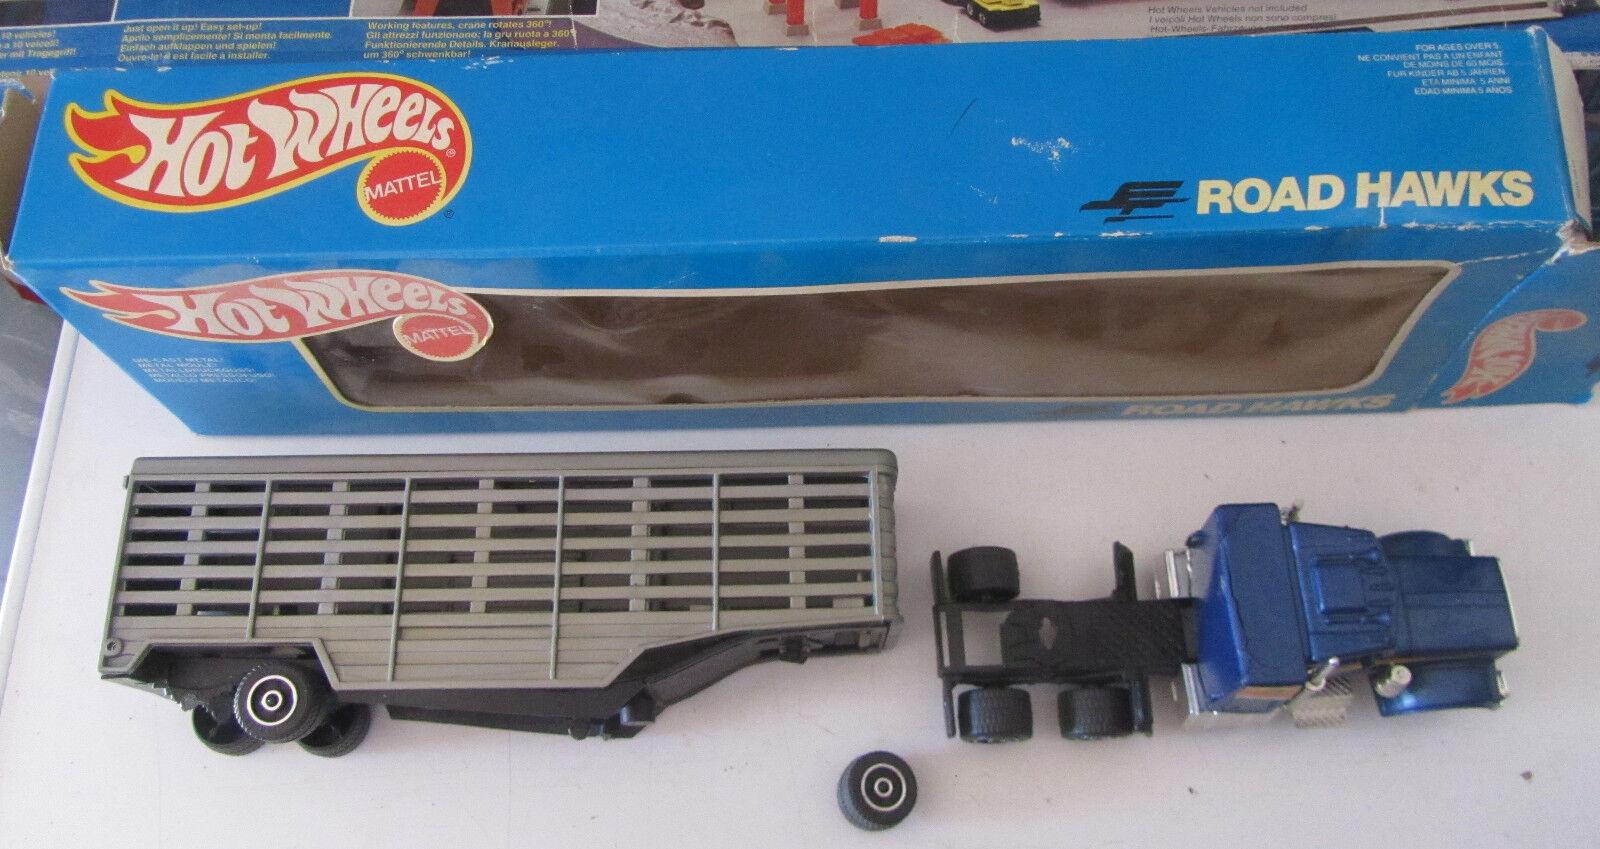 Camion Hot wheels Road Hawks rossoTAME vintage anni 80